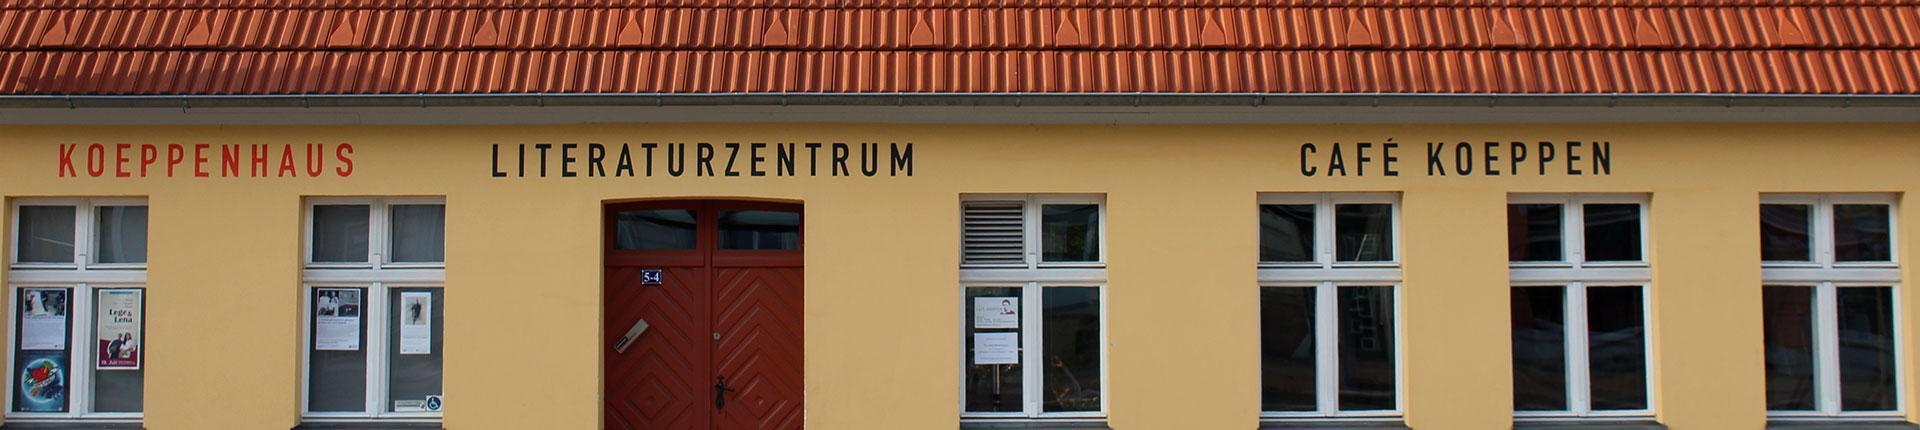 Koeppenhaus – Literaturzentrum & Café